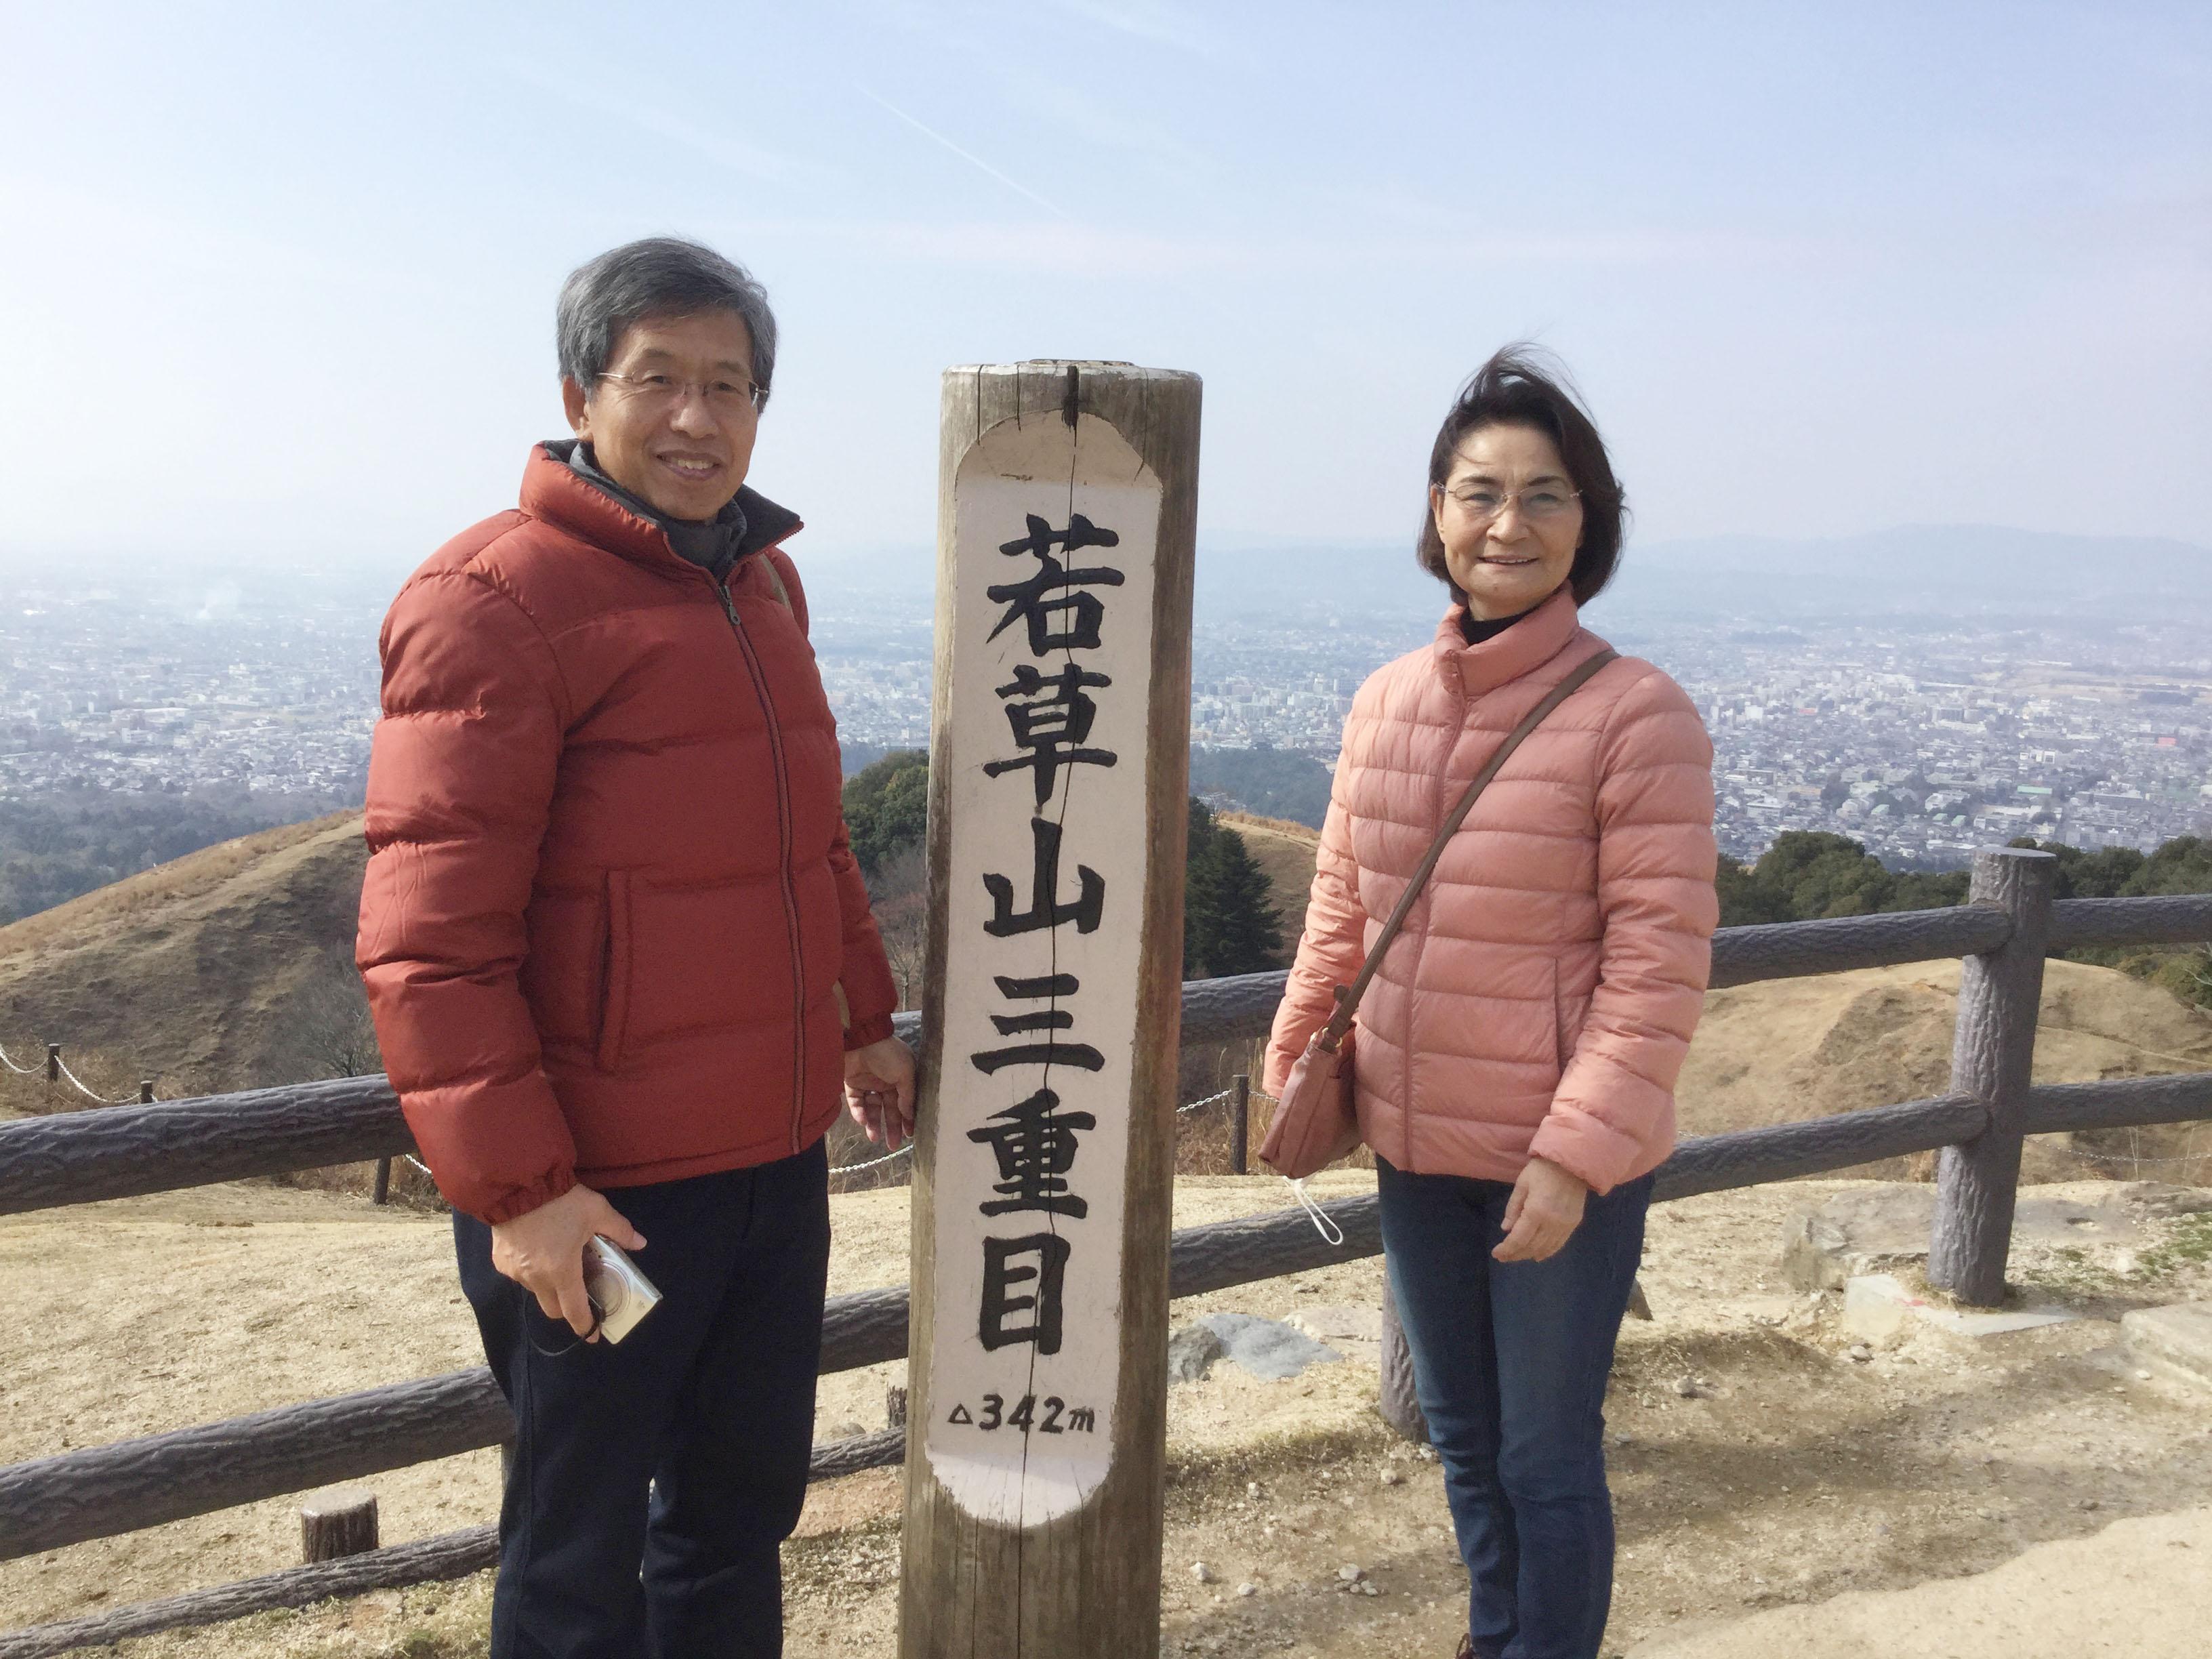 奈良 世界文化遺産で初詣W参拝ツアー催行!